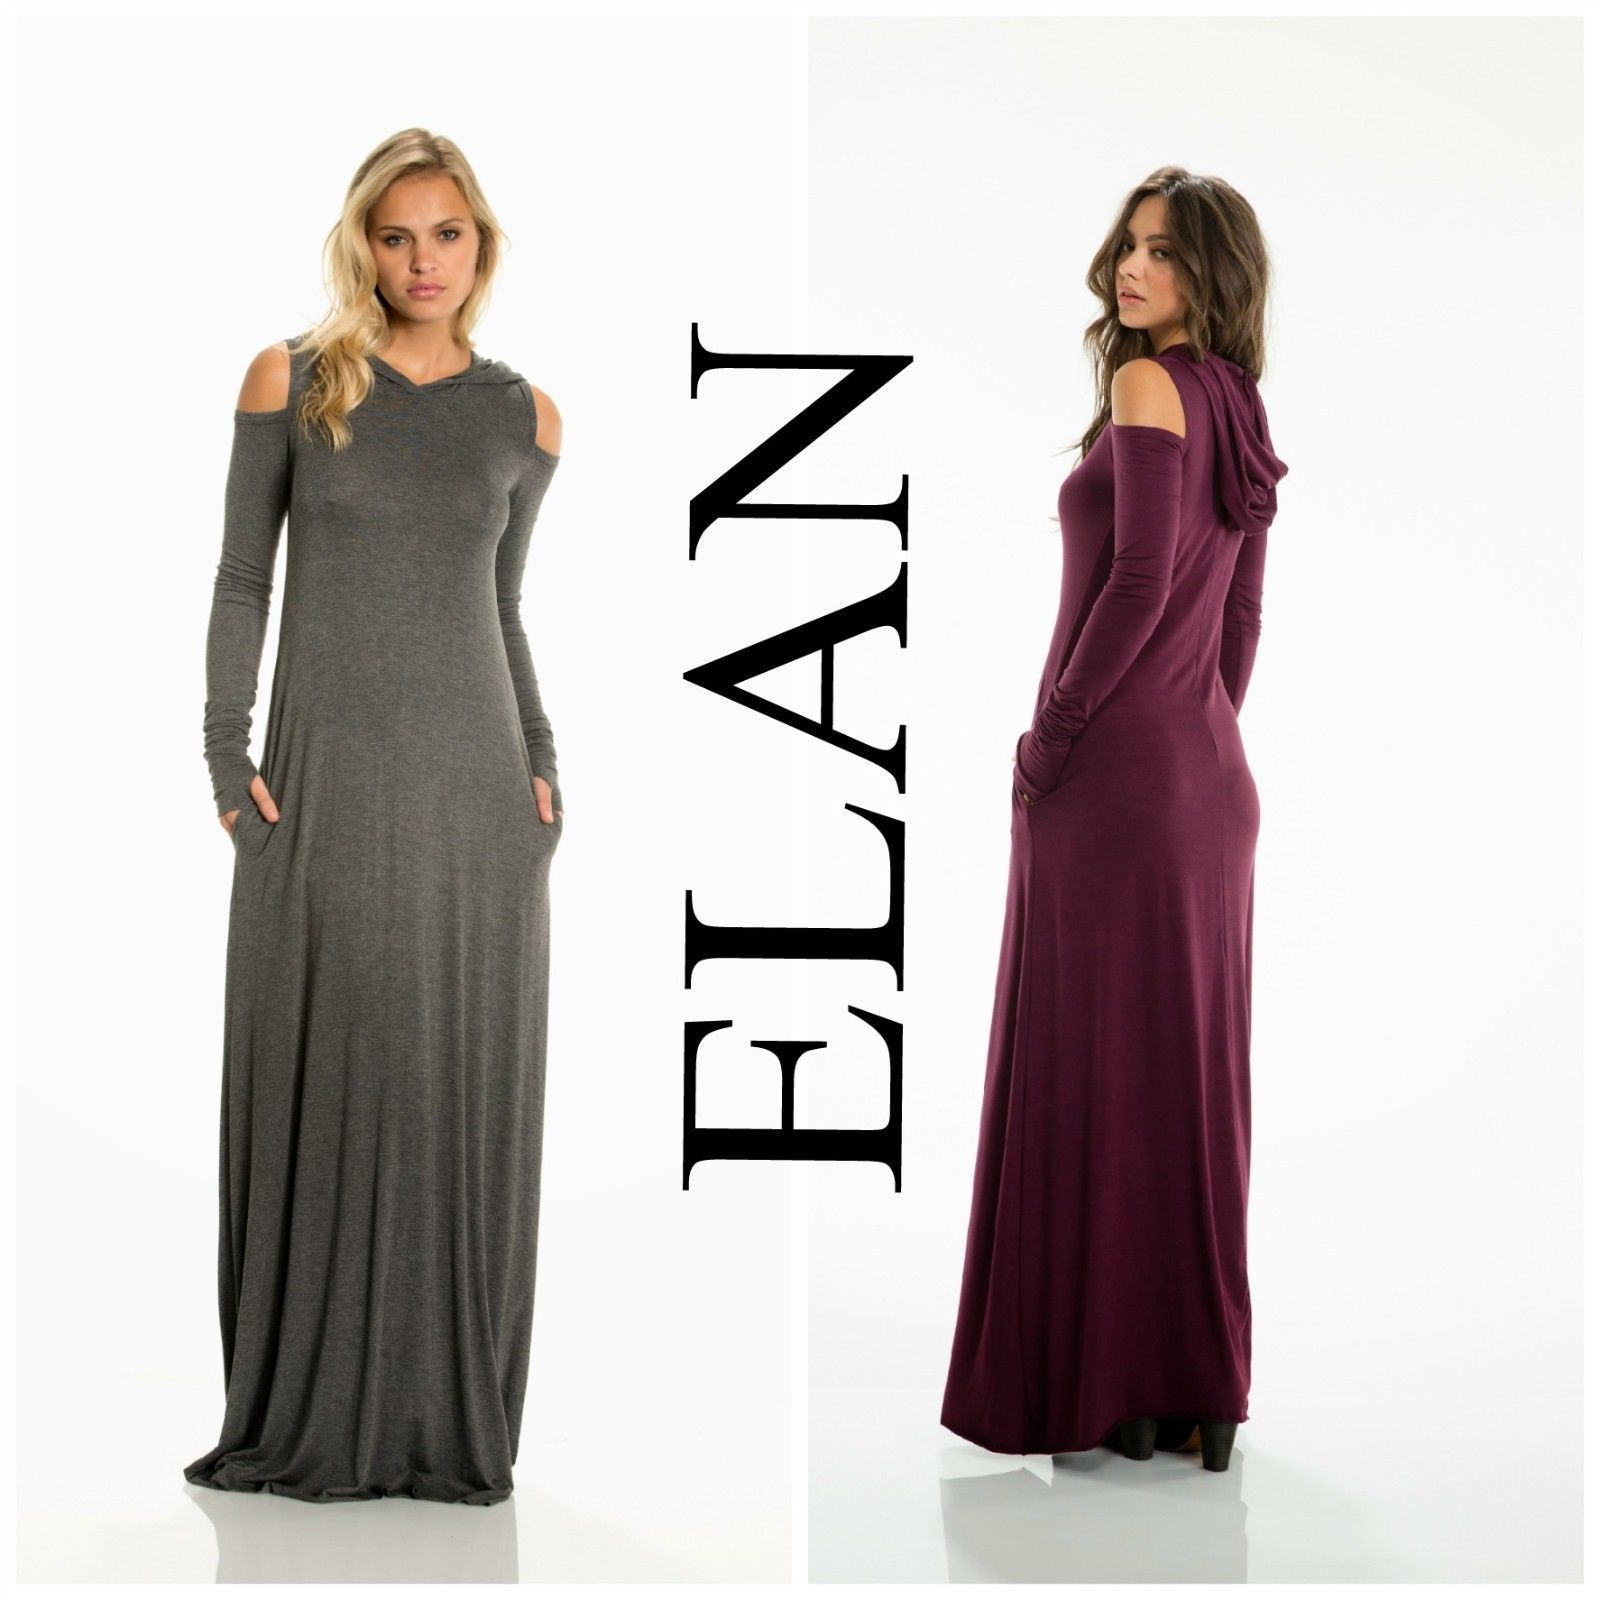 5b6d6cd1a34 ELAN MD5037 Sexy Long Sleeve COLD SHOULDER HOODIE Maxi Dress Charcoal    Burgundy